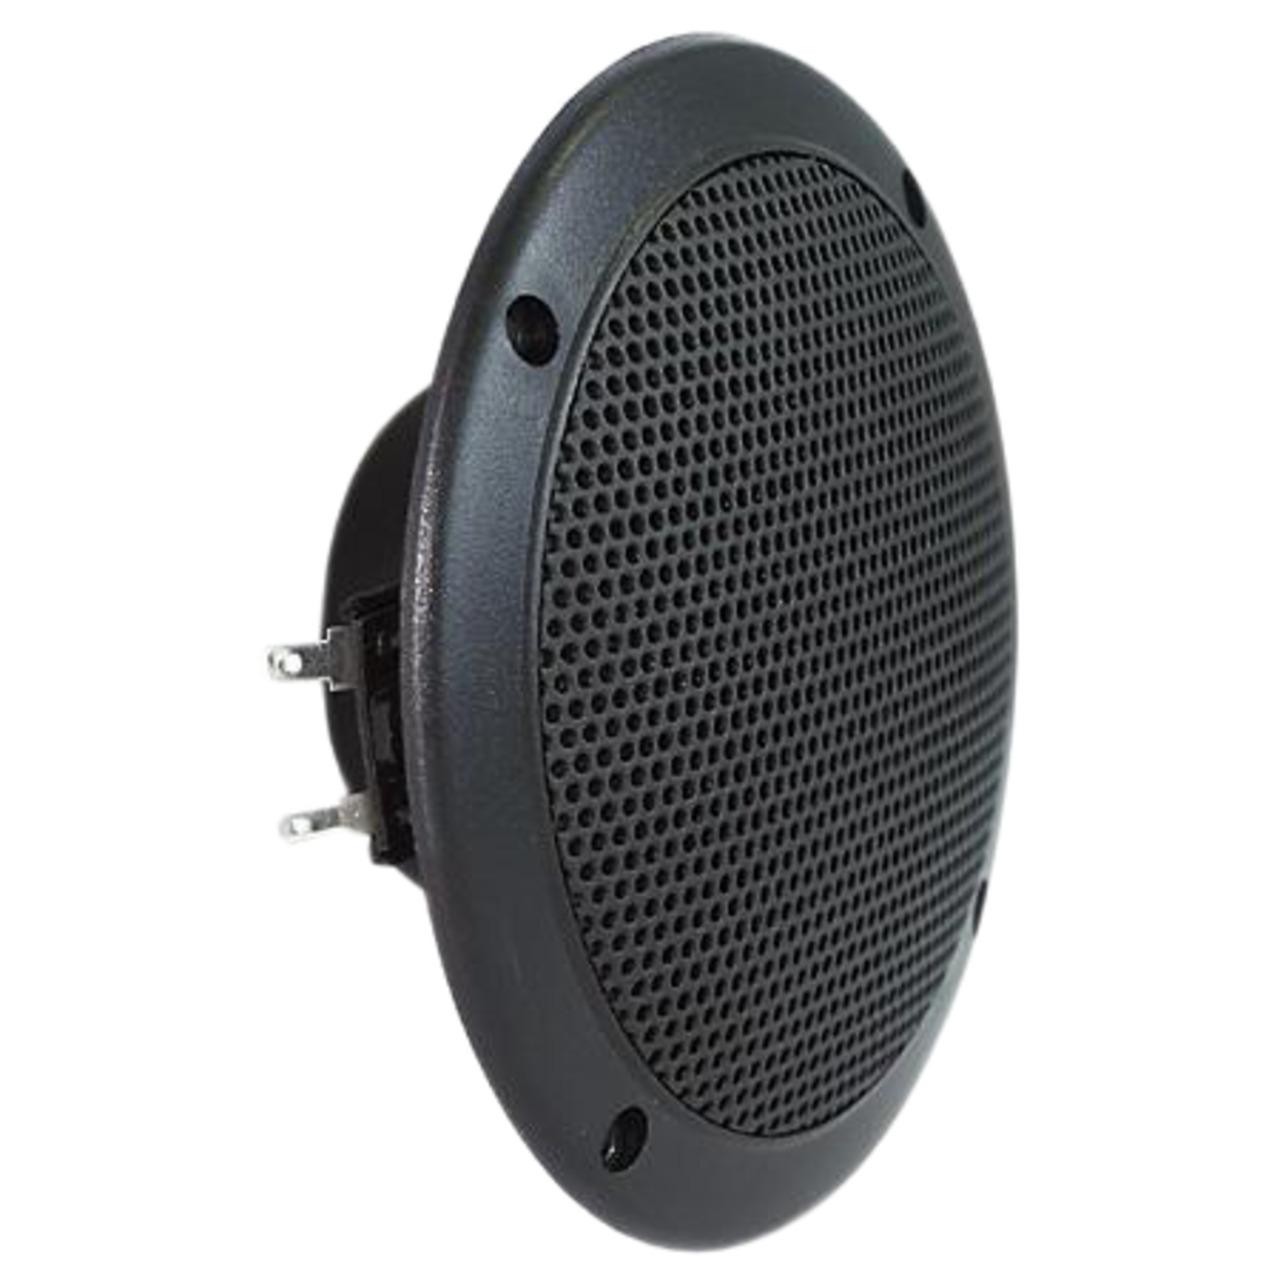 VISATON wasserfester Breitbandlautsprecher 13cm- FR 13 WP- schwarz - 4 Ohm